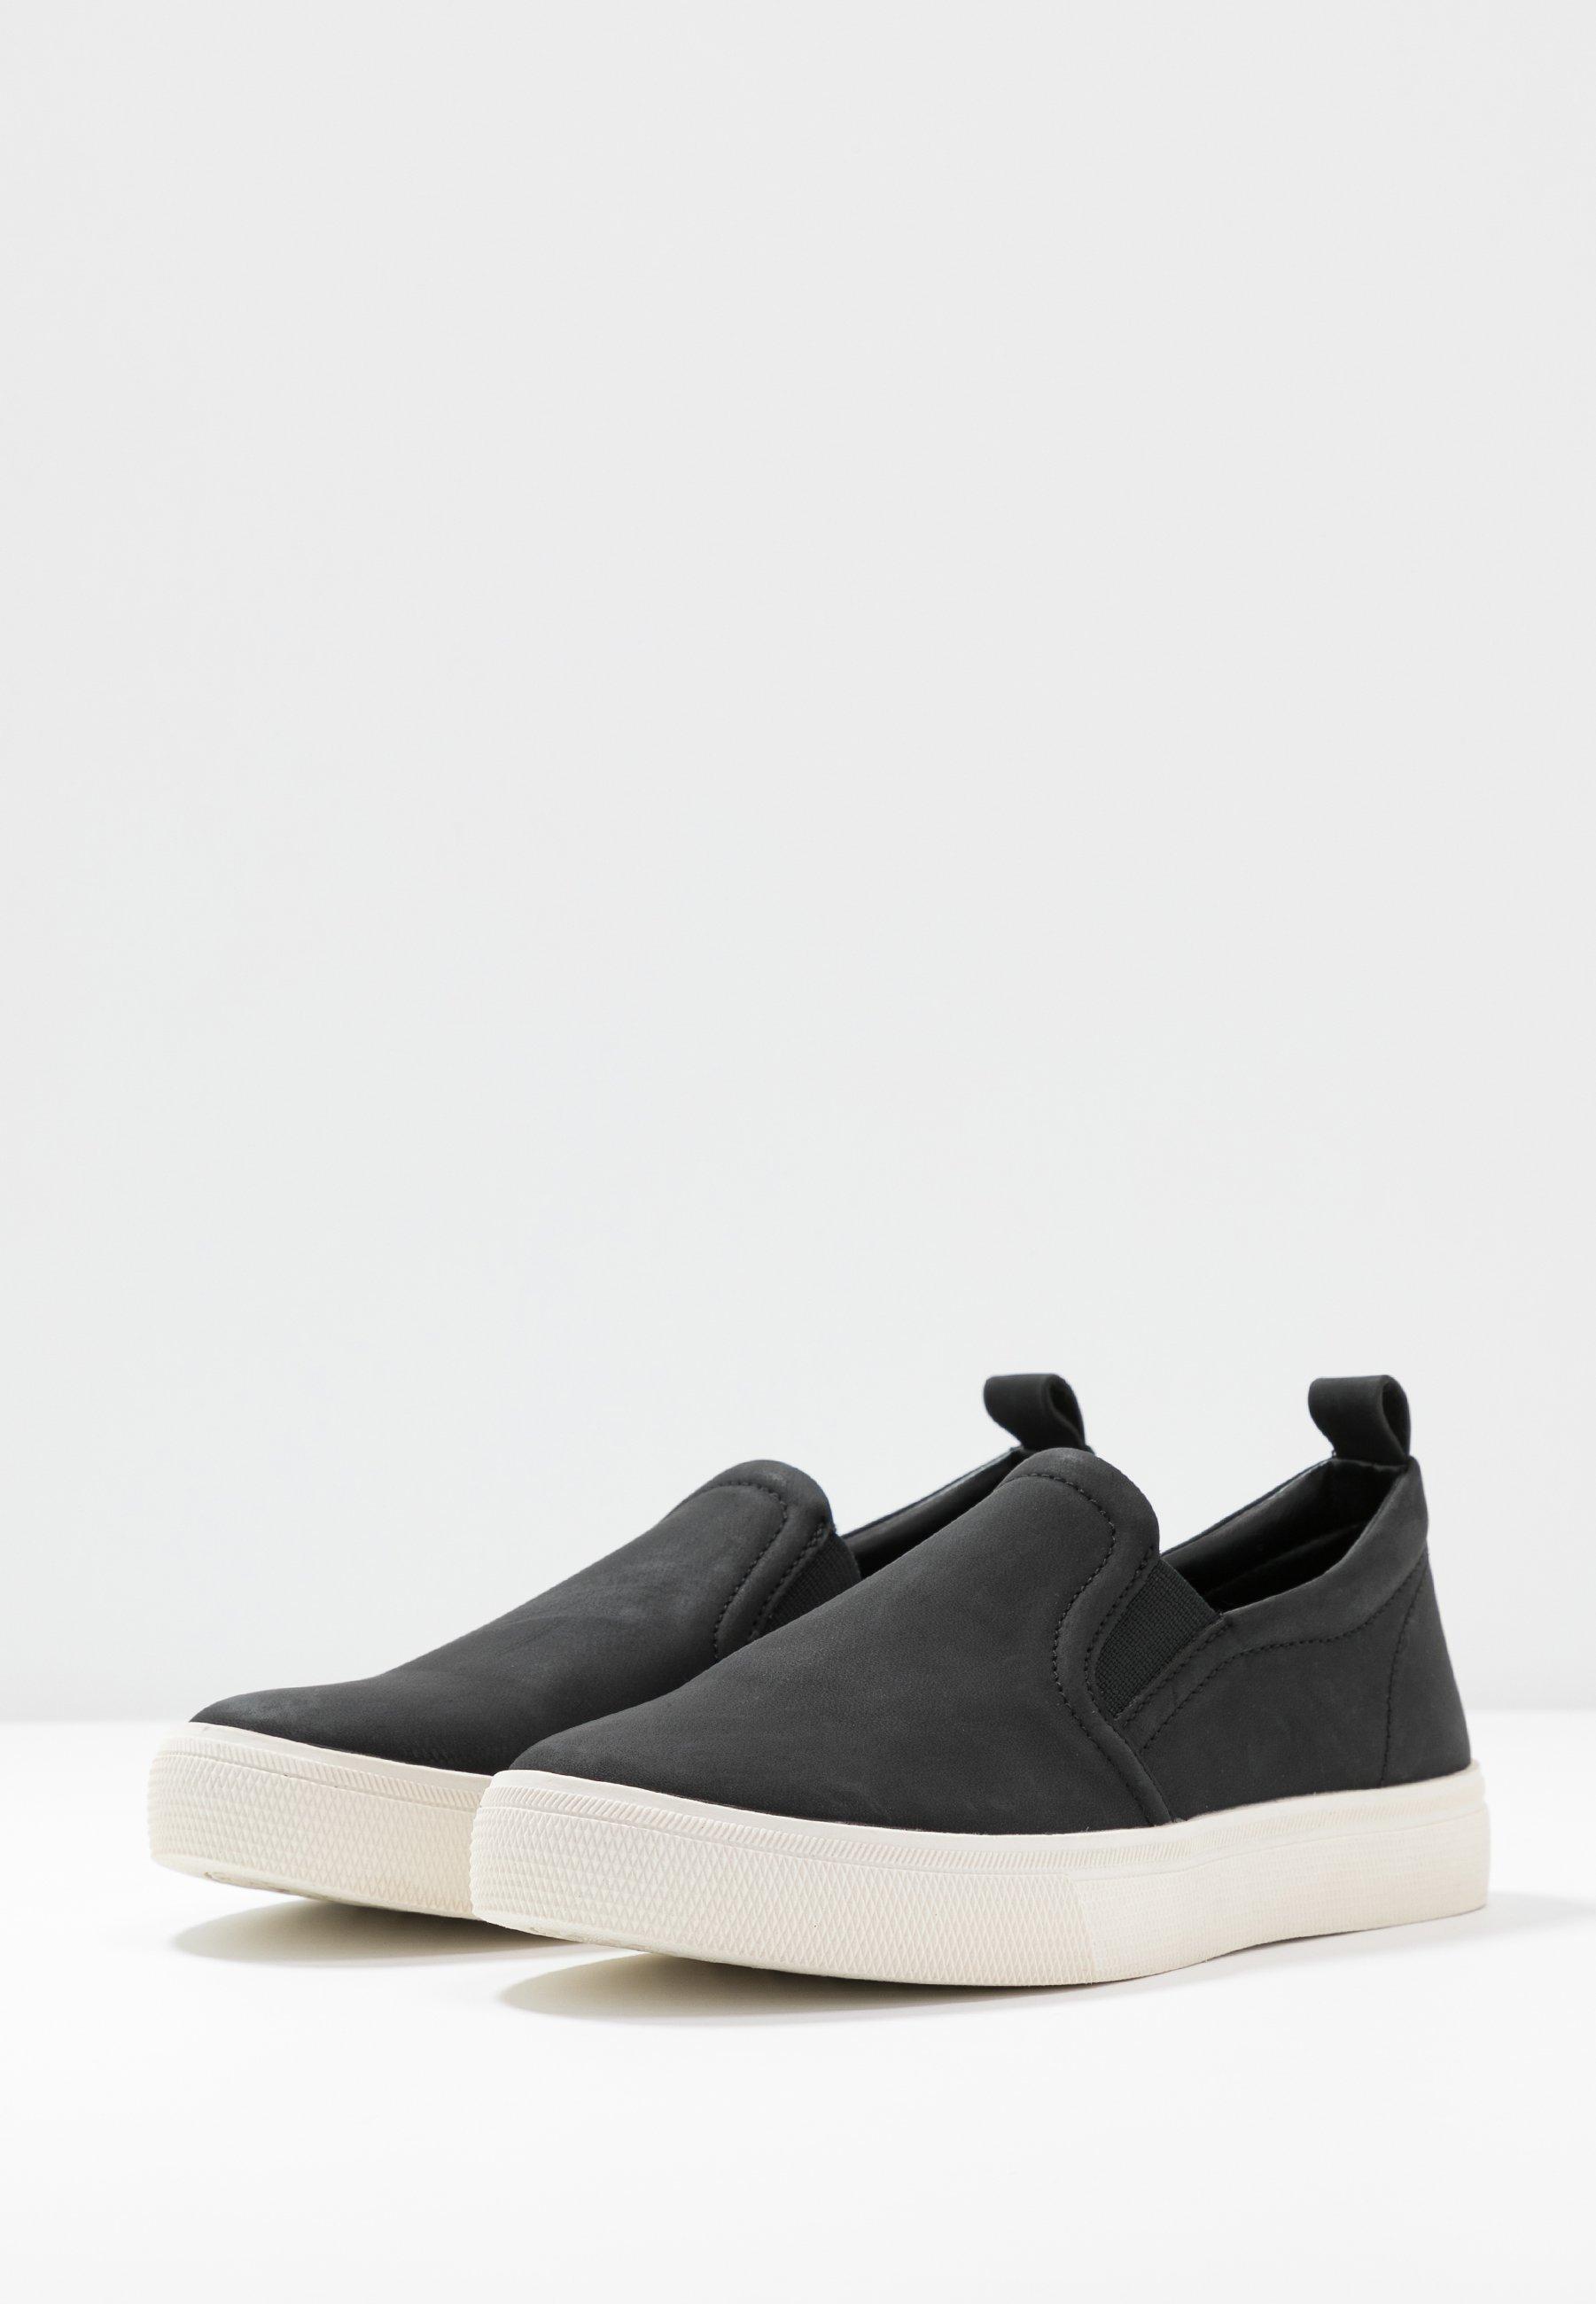 Esprit Semmy - Loafers Black